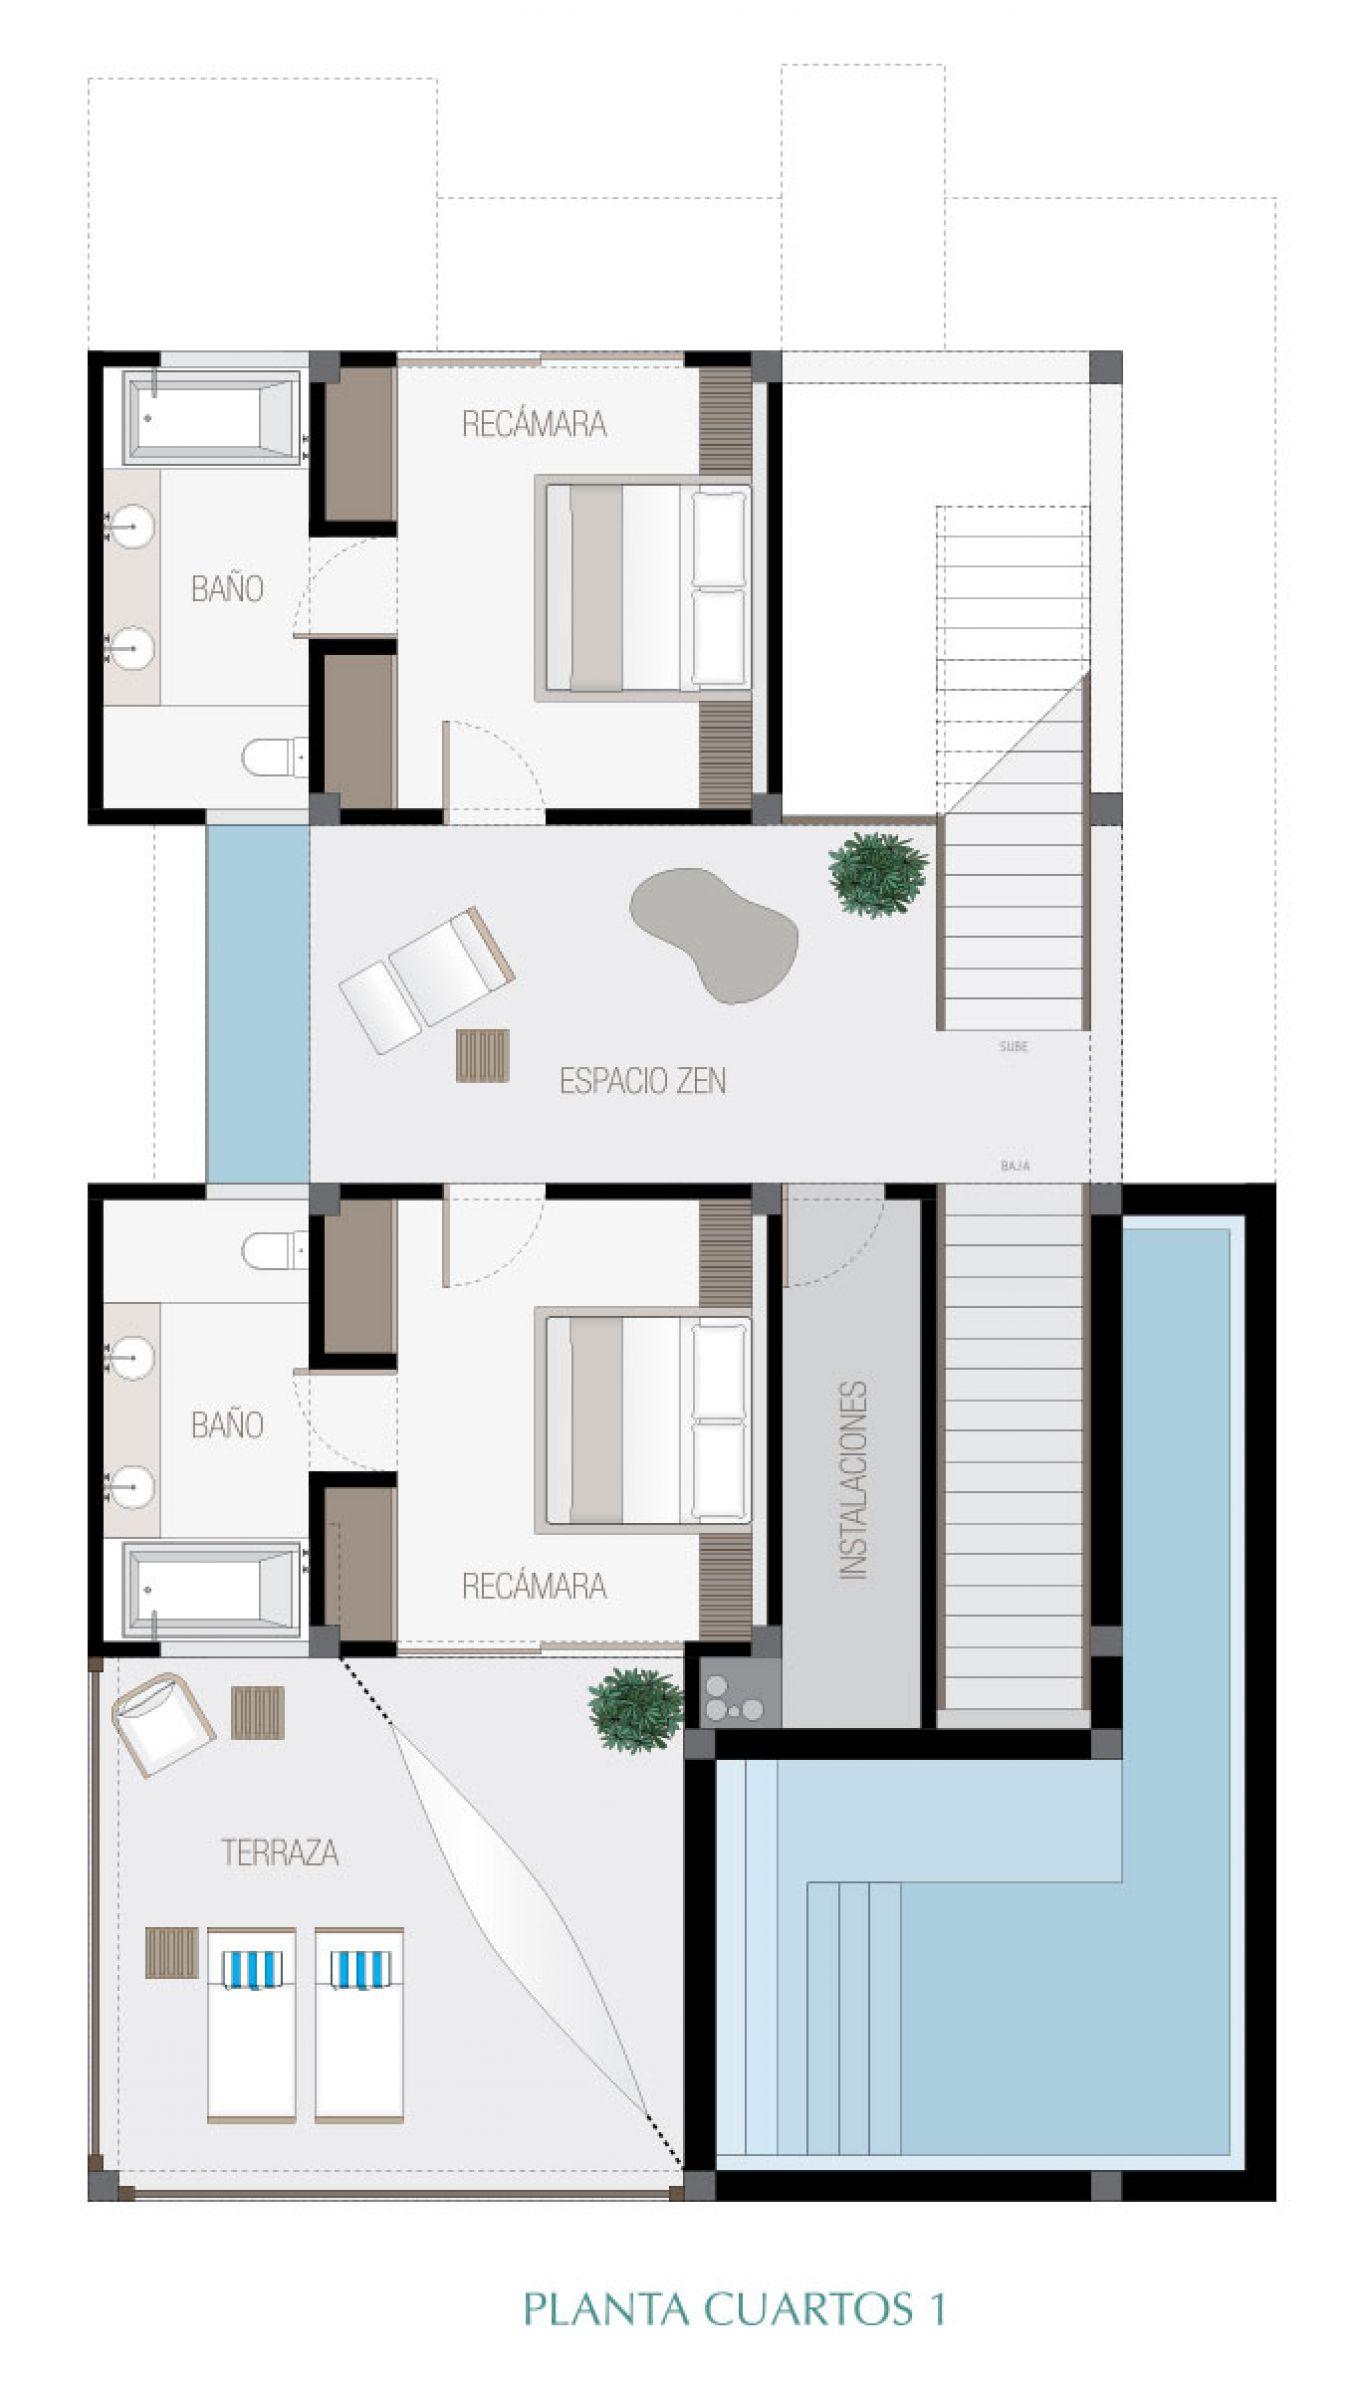 Manai, id 1519068, no 2, plano de villa 4, 296